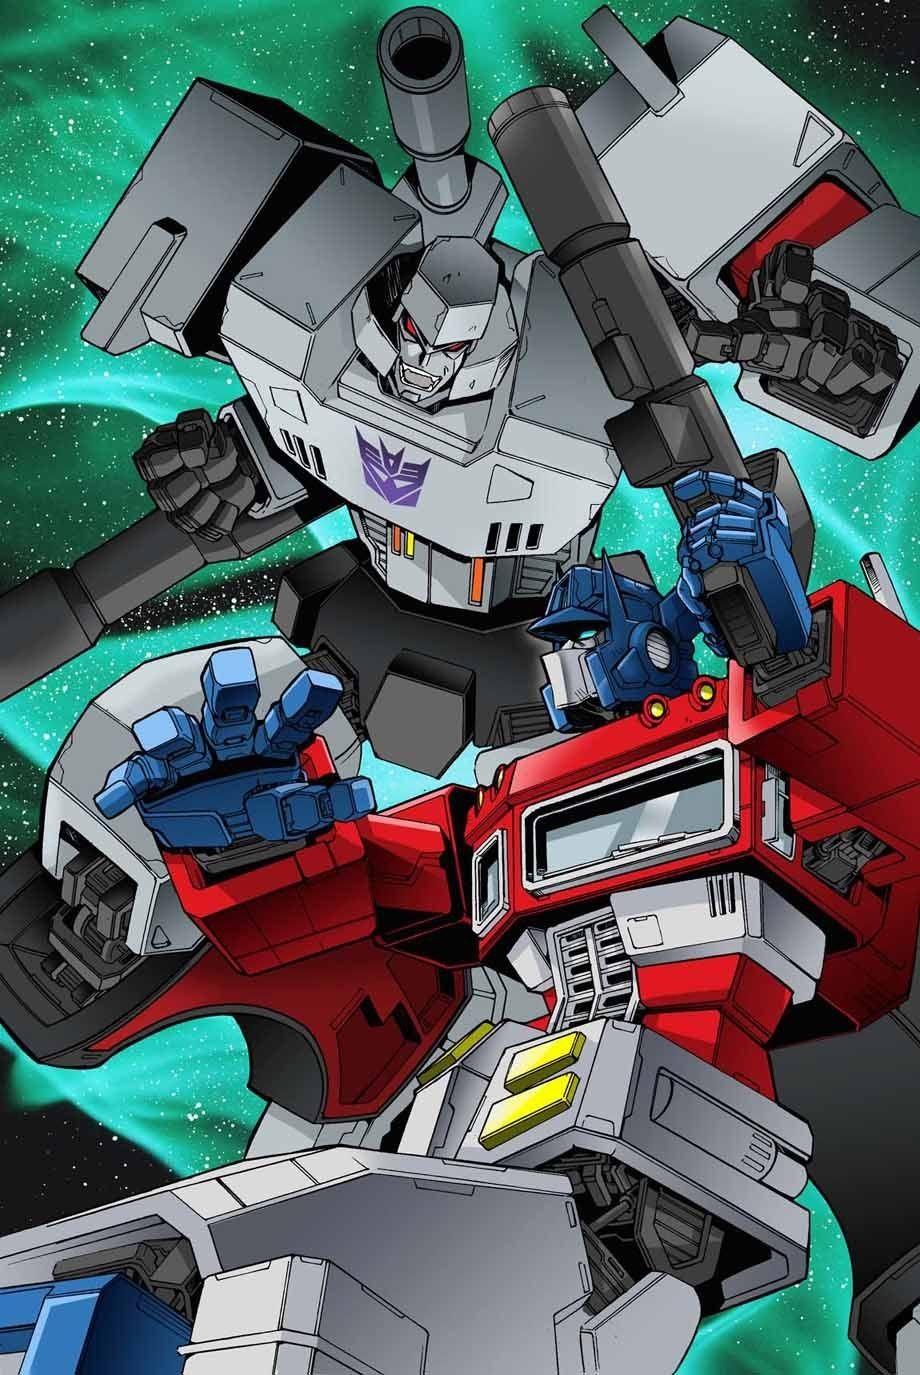 Megatron and optimus transformers transformers - Transformers cartoon optimus prime vs megatron ...